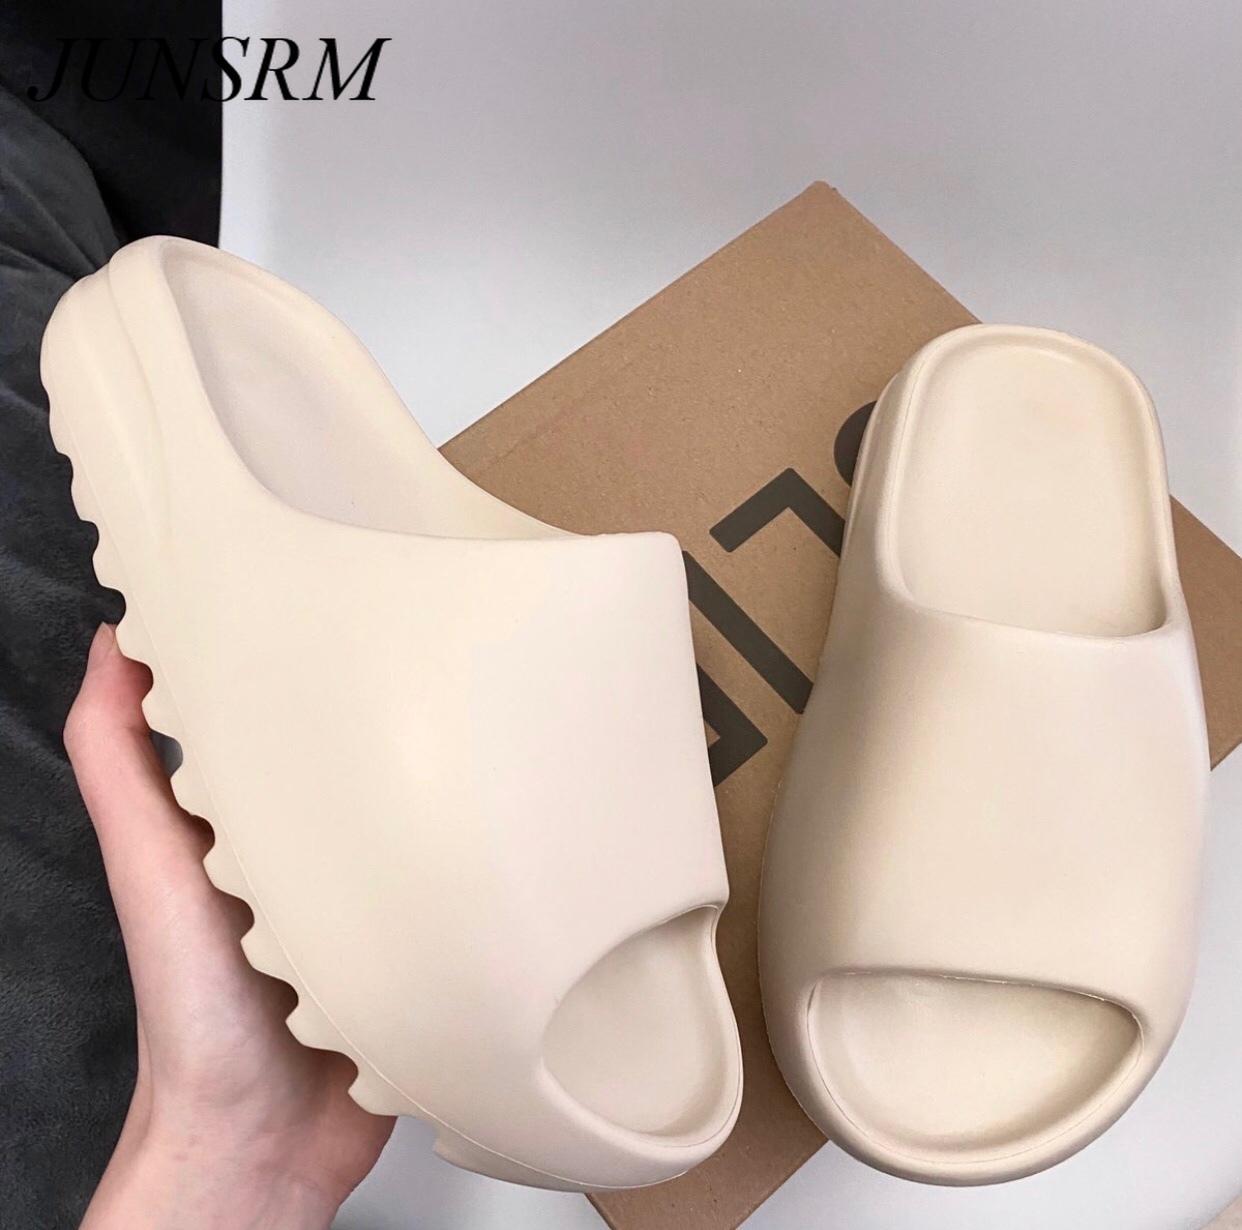 Summer Slippers Men Women Indoor Eva Cool Soft Bottom Sandals Trend Slides Light Beach Shoes Slippers Home big size 46